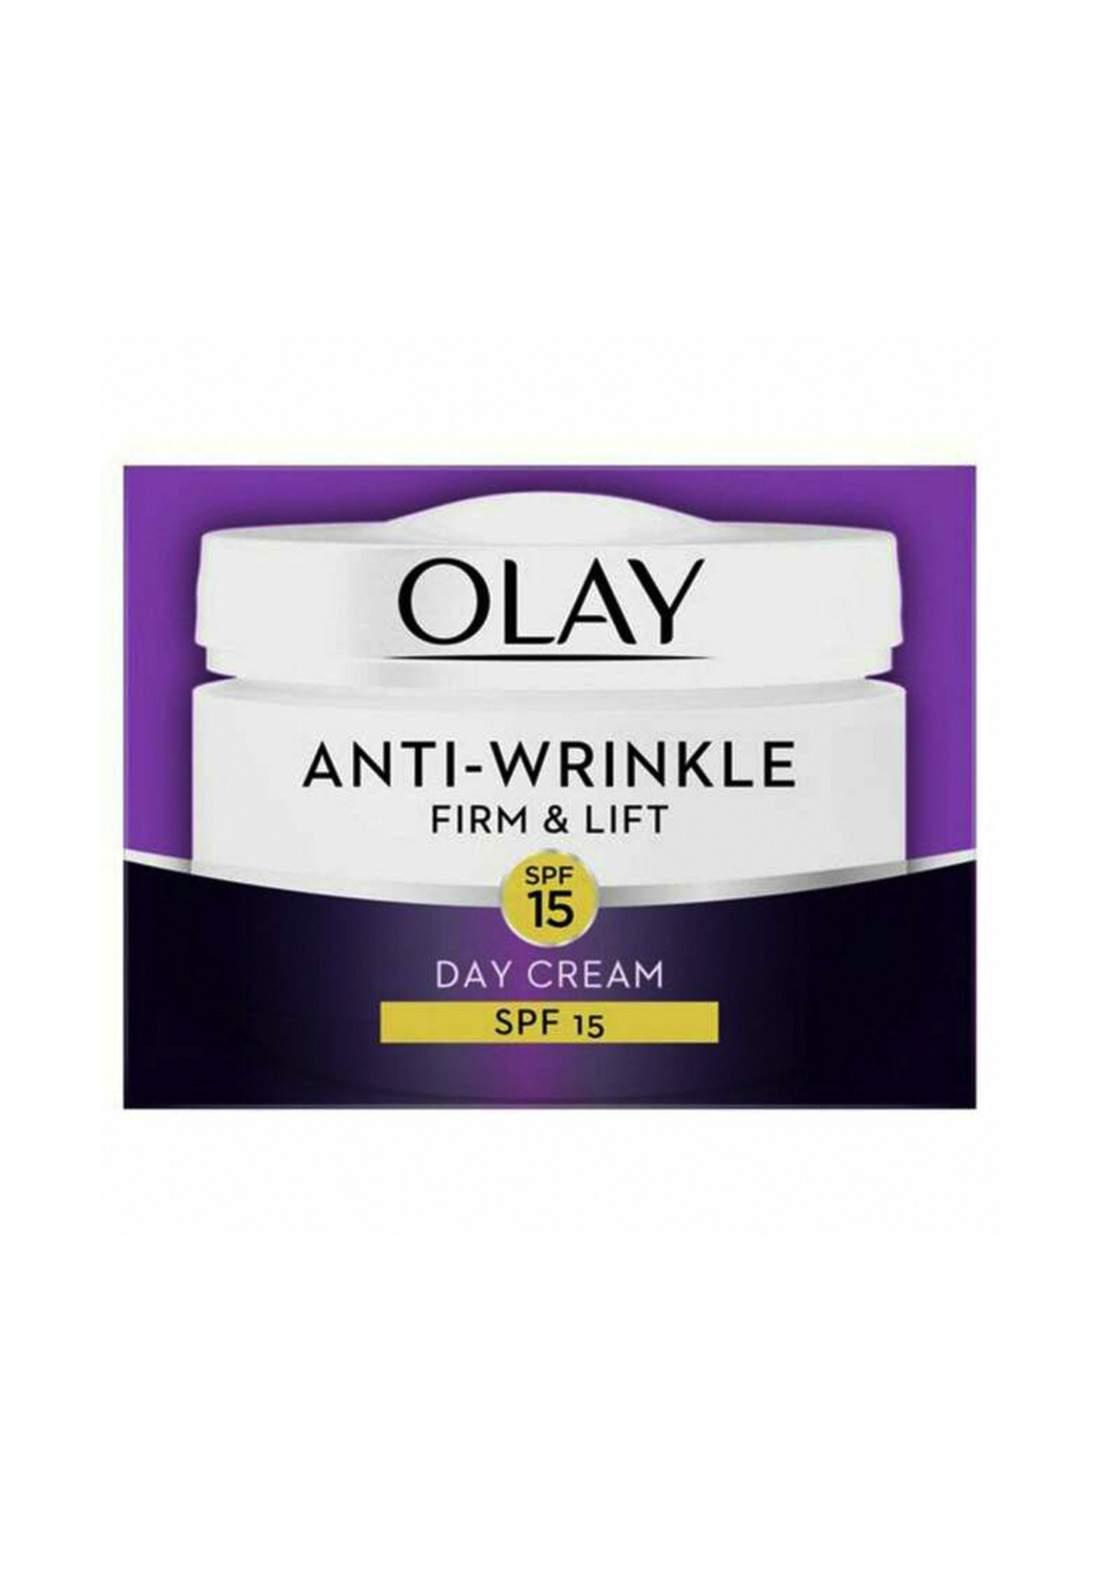 Olay (1137a007f0) Anti-Wrinkle Firm & Lift Day Cream Spf15 50ml كريم نهاري مقاوم للتجاعيد